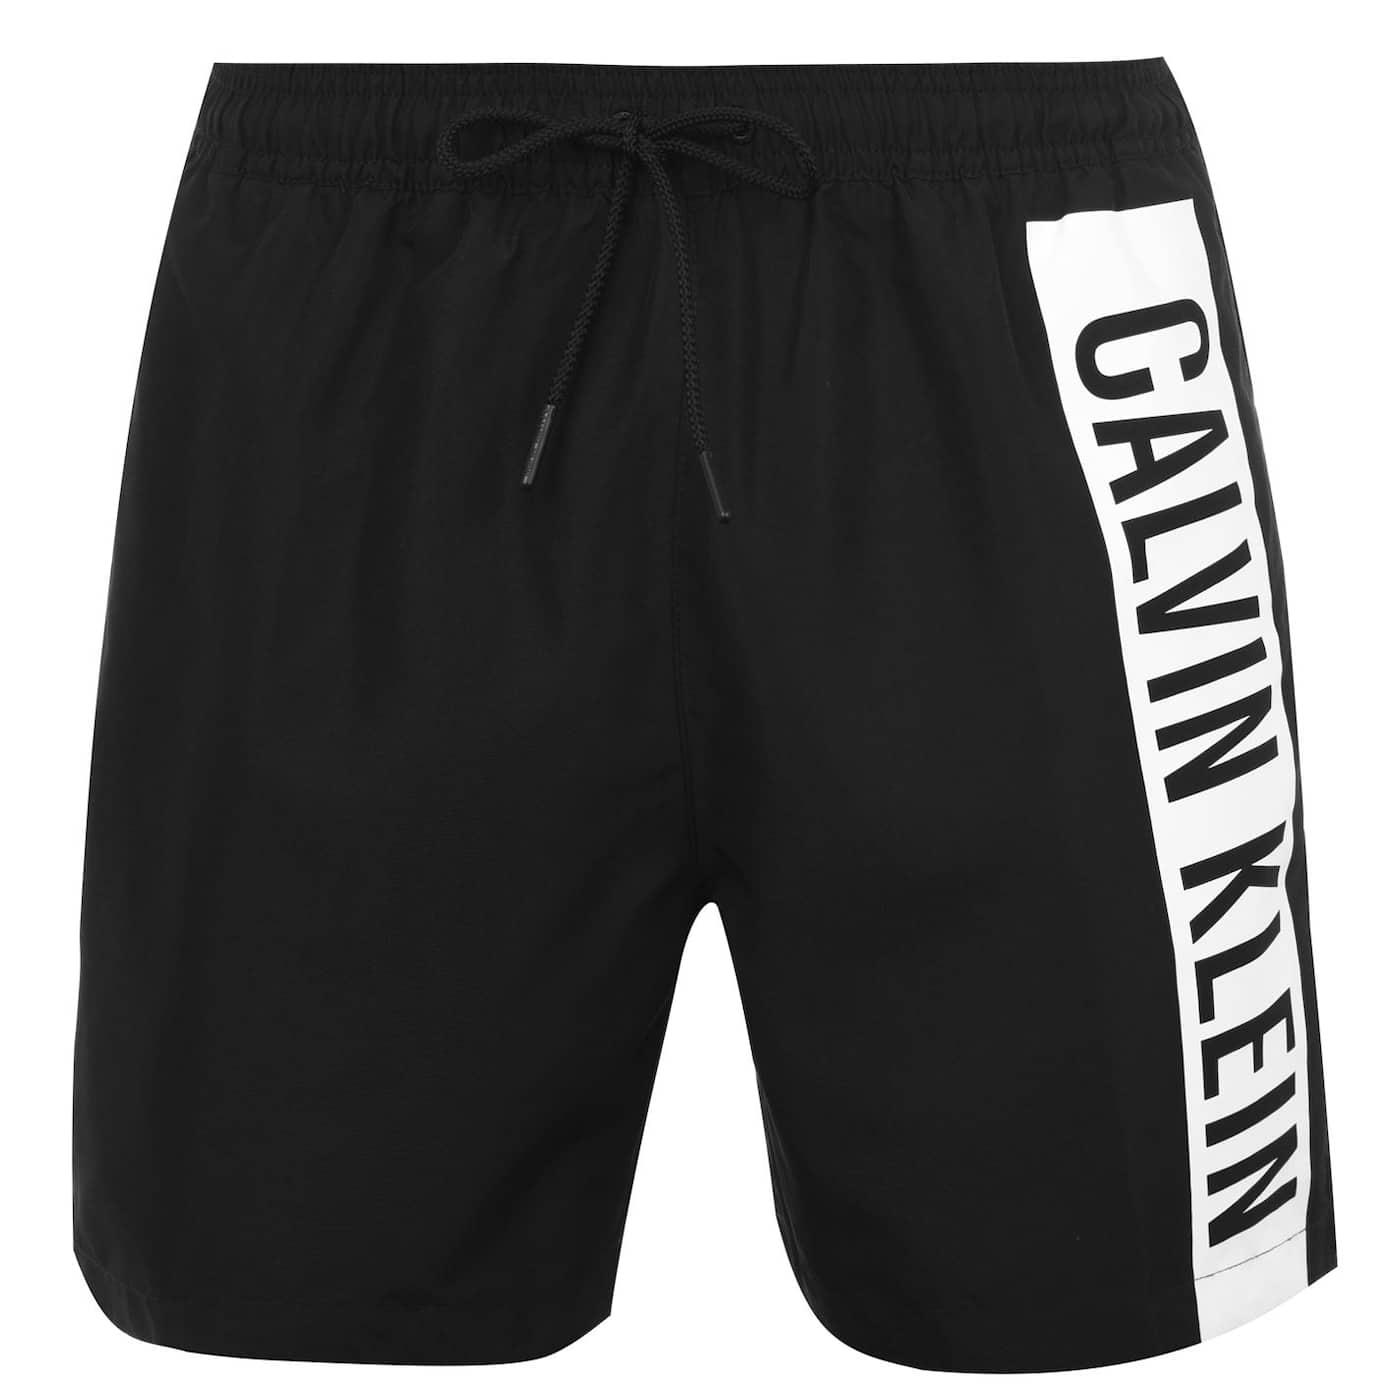 Calvin Klein Intense Medium Swim Shorts